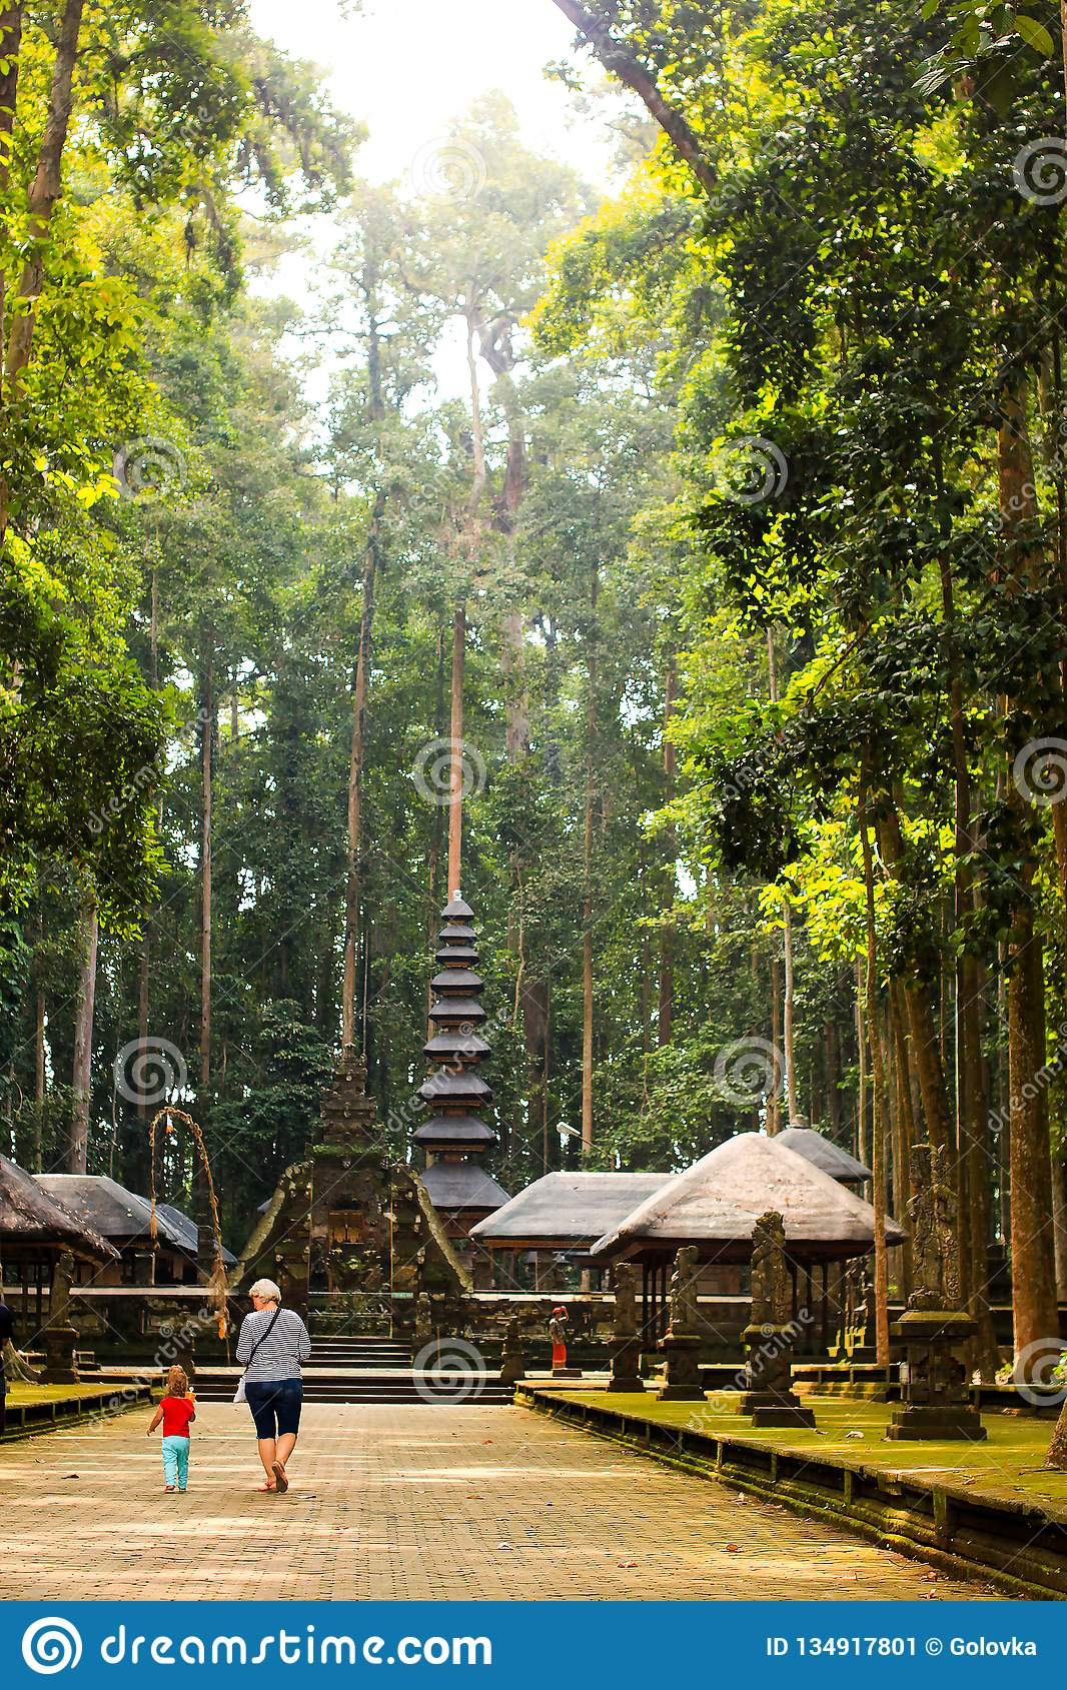 Sangeh Monkey forest in Bali, Indonesia